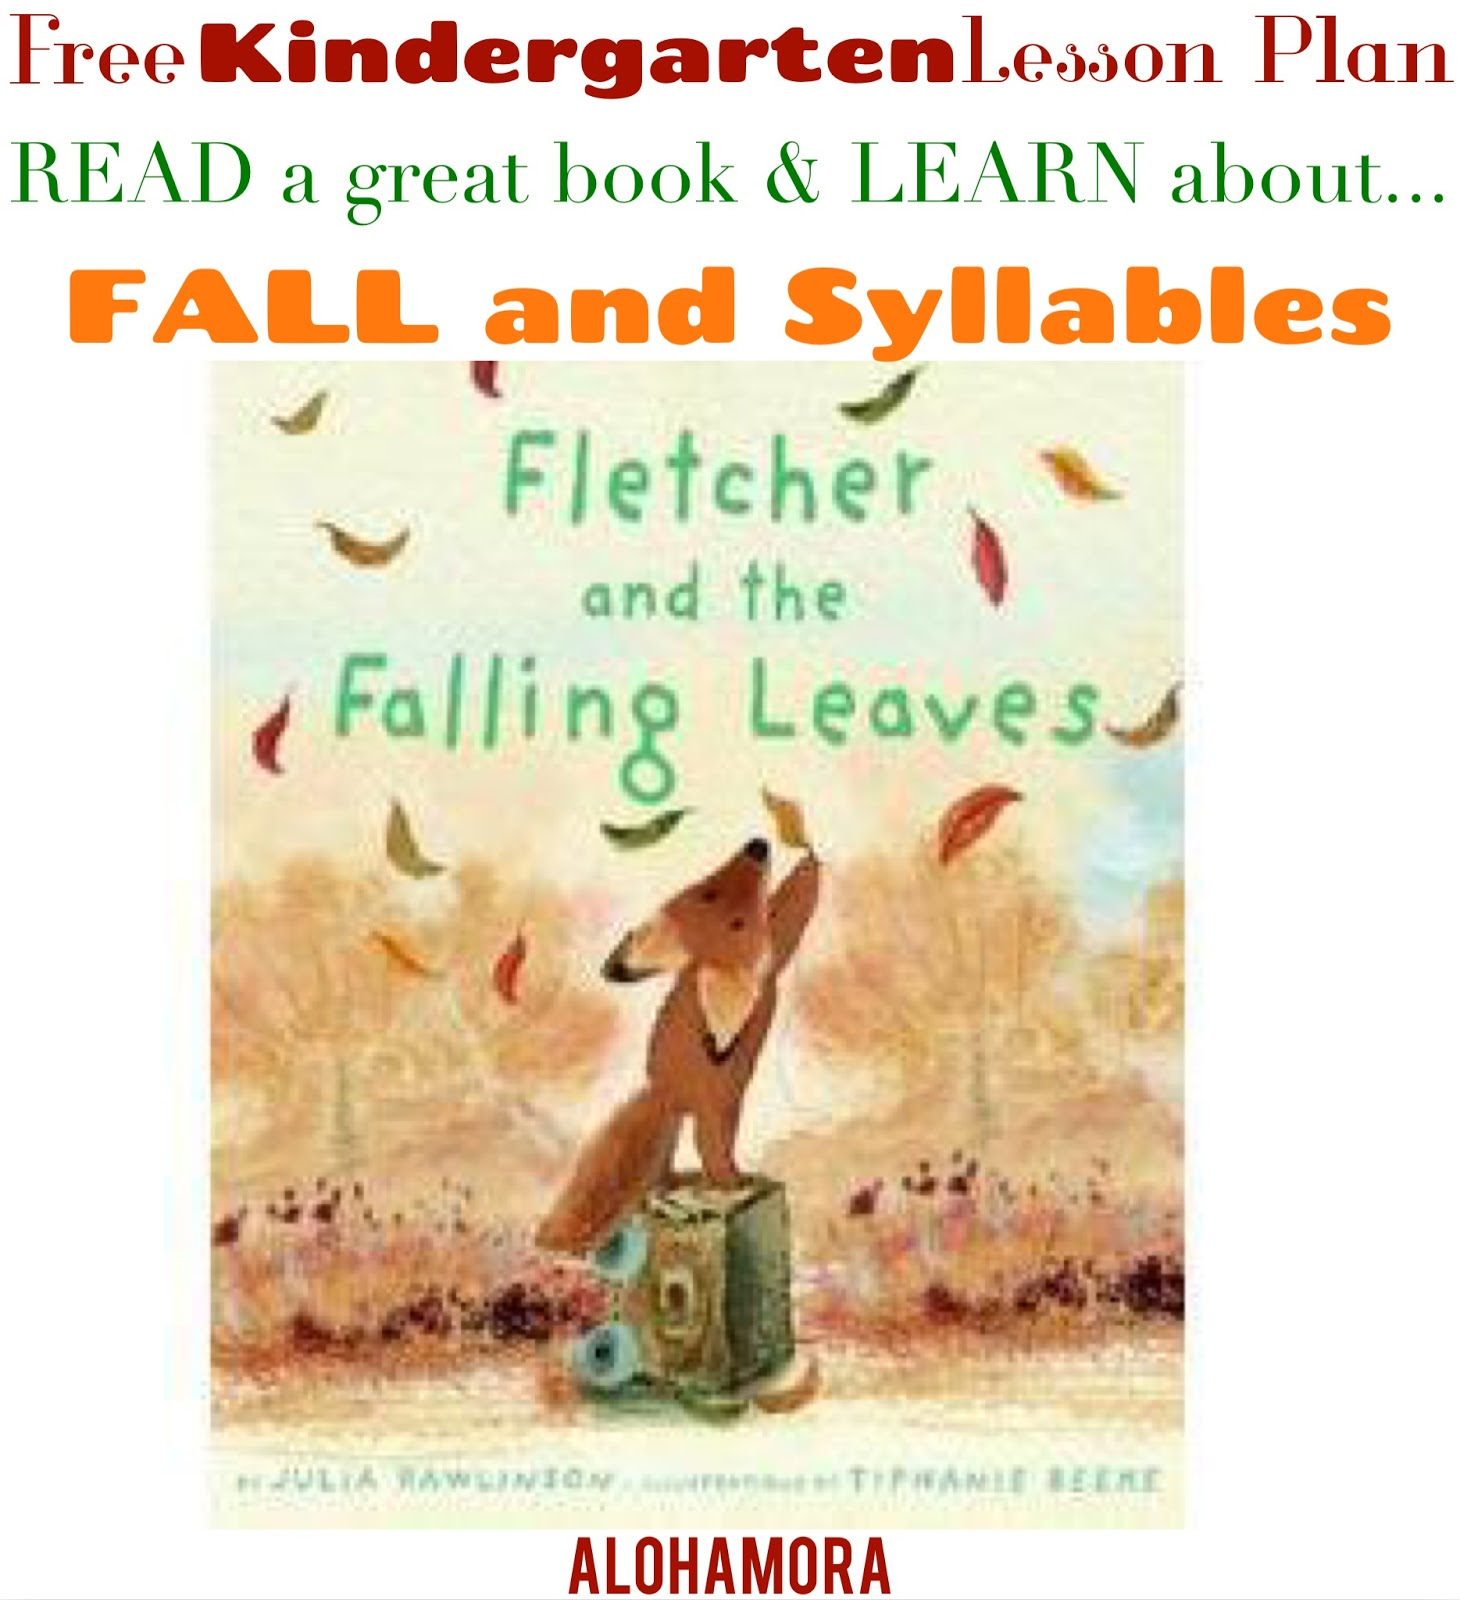 Alohamora Open A Book Kindergarten Free Lesson Plan For